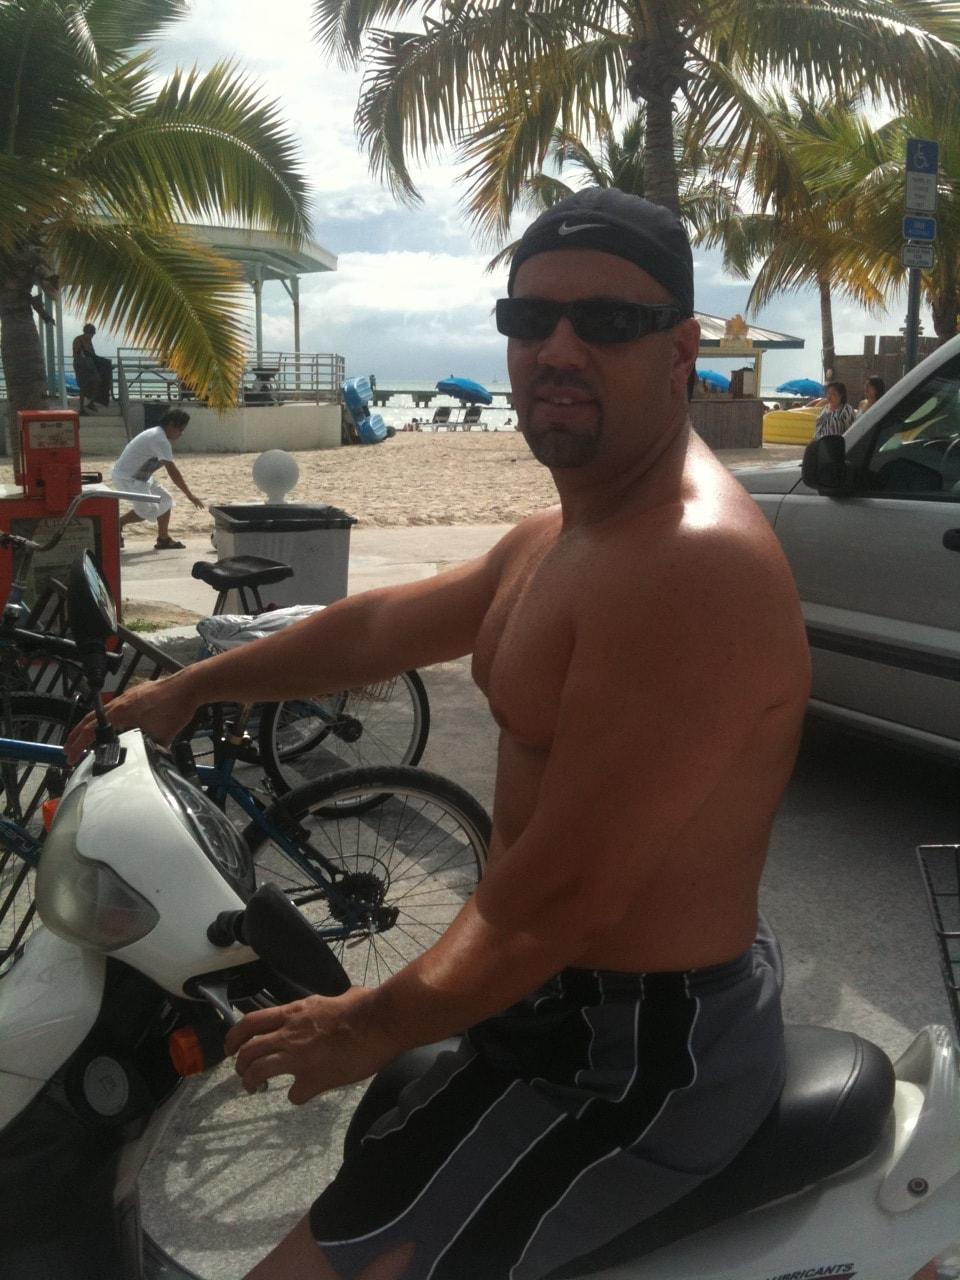 Raul from Fajardo